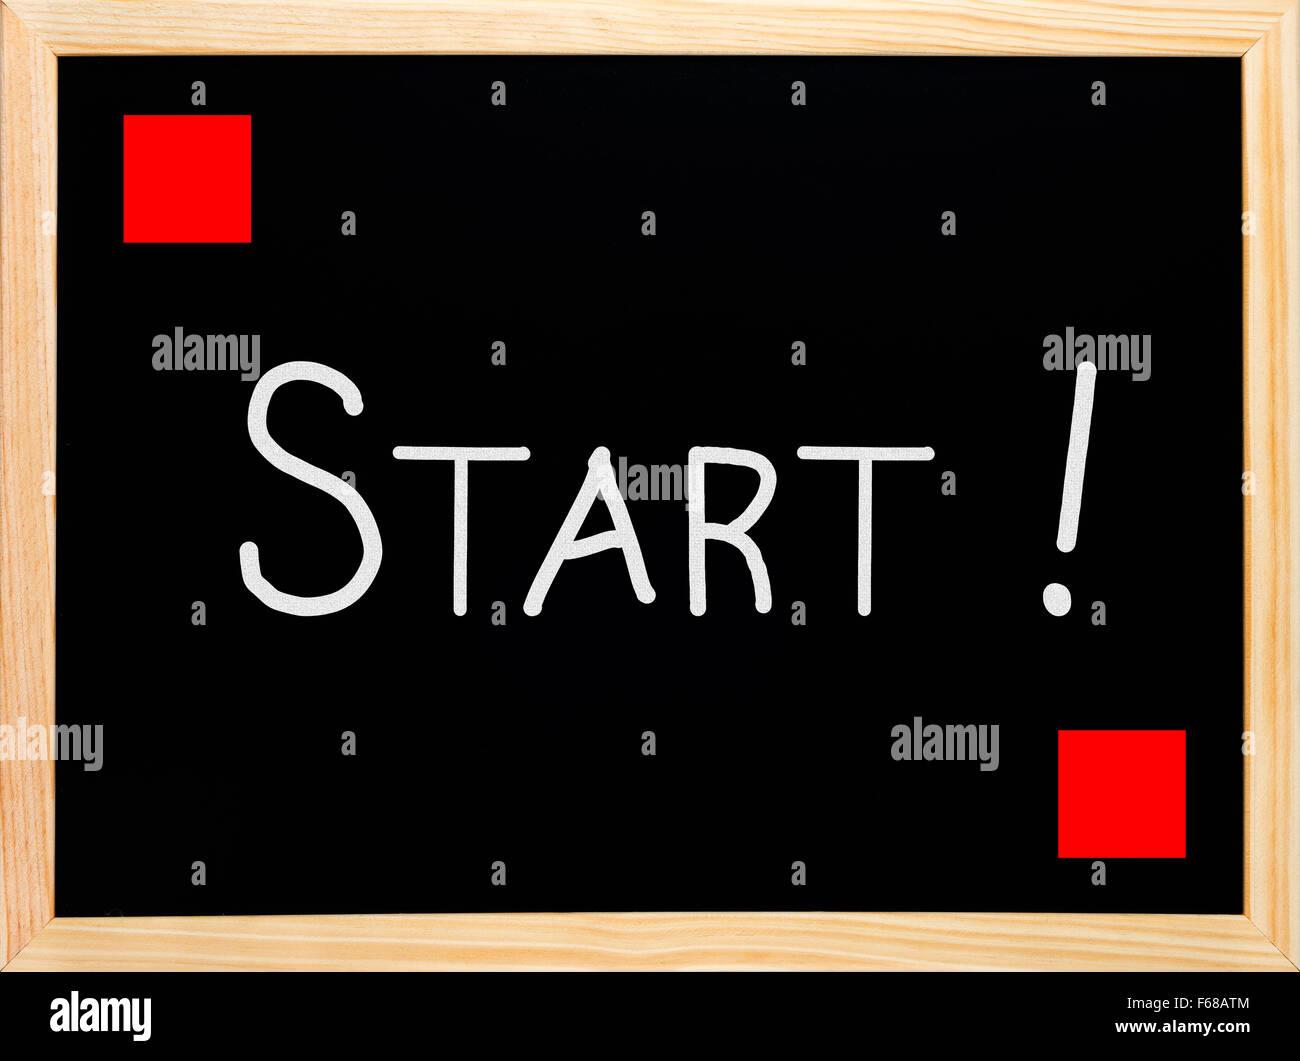 Start and red flag written on blackboard or chalkboard - Stock Image